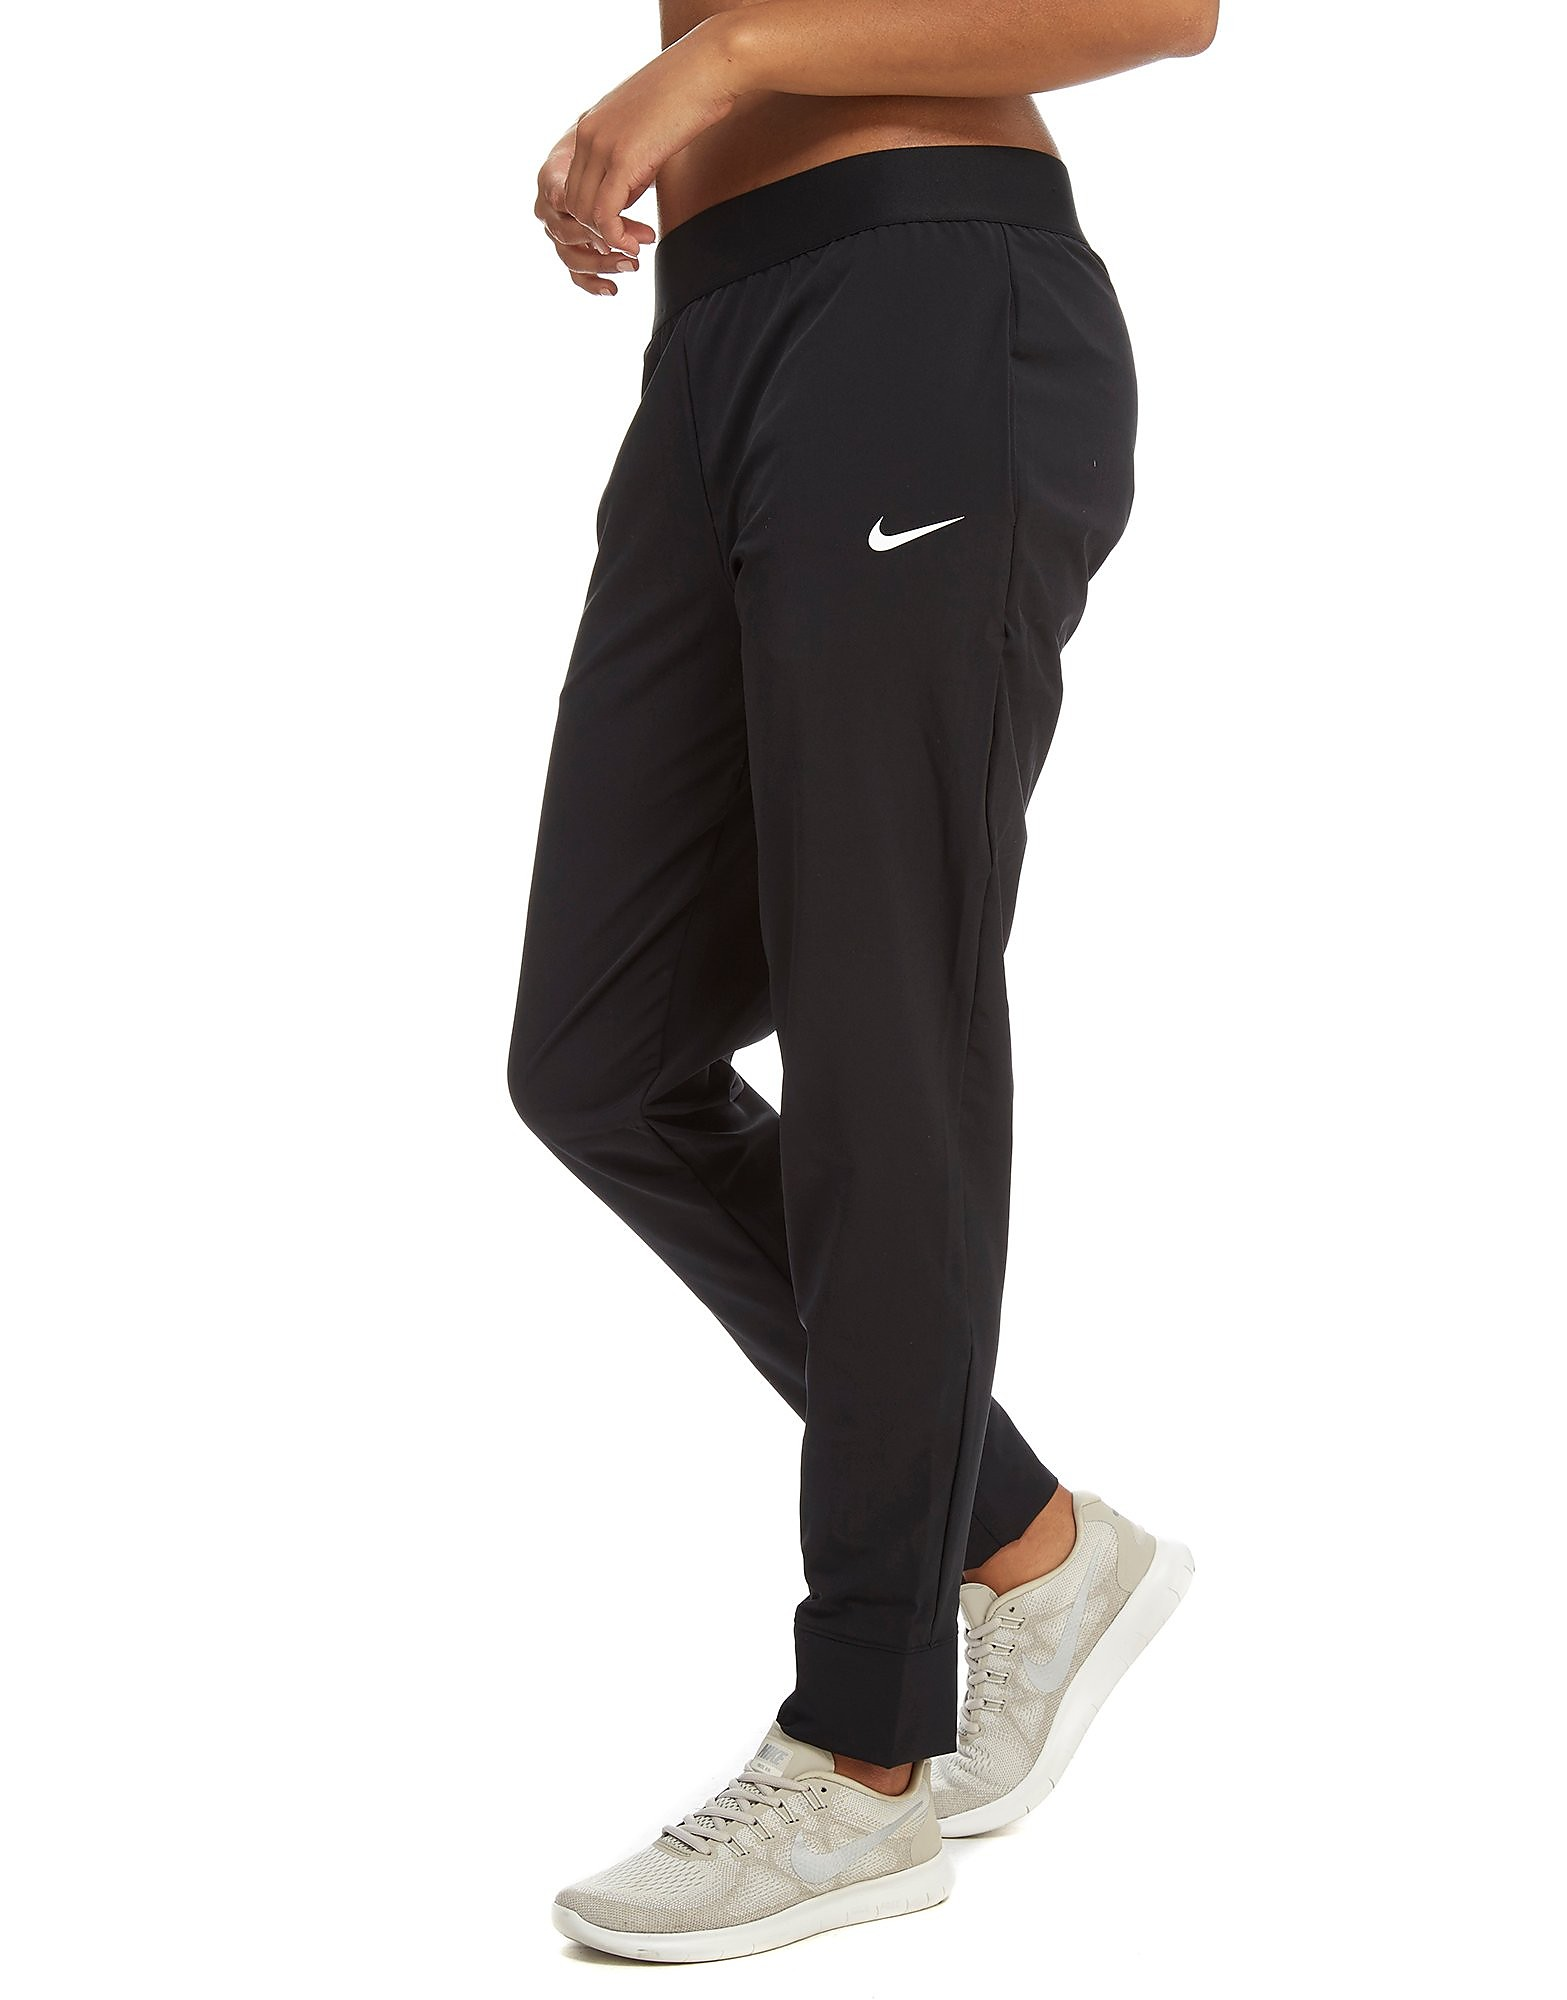 Nike Pantalon Bliss Femme